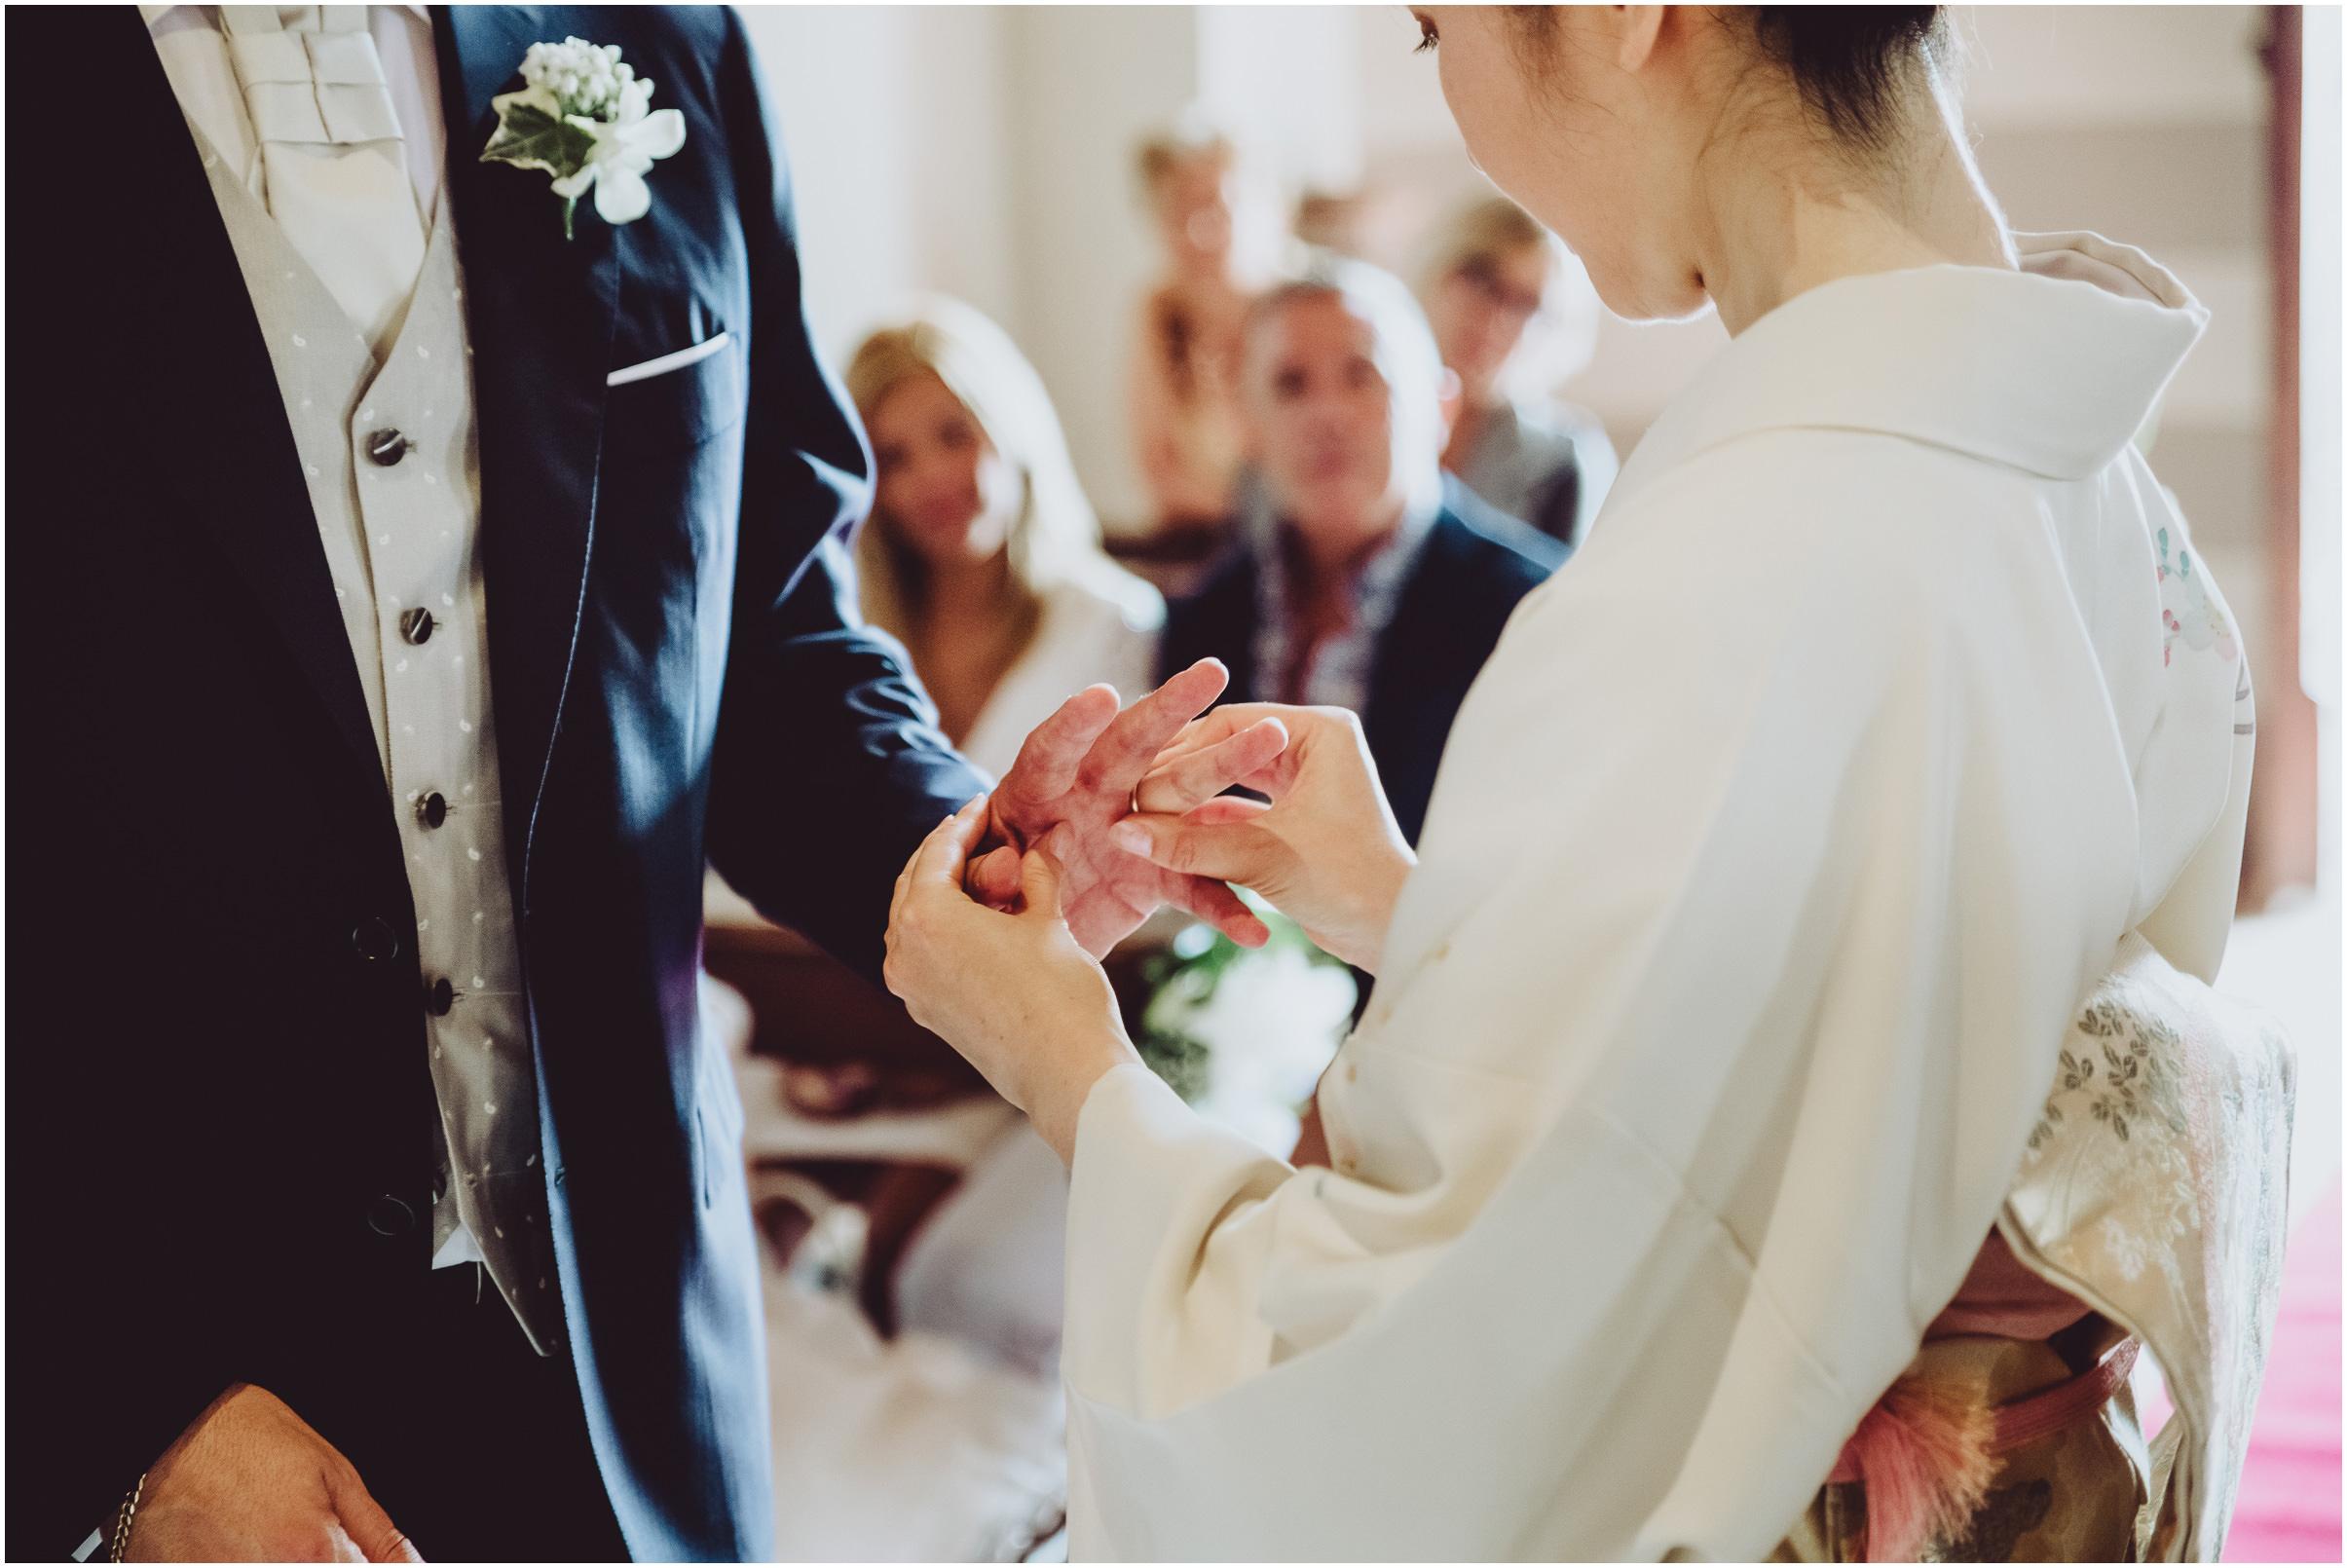 WEDDING-PHOTOGRAPHY-SARA-LORENZONI-FOTOGRAFIA-MATRIMONIO-ORVIETO-JUKA-ANTONELLO17